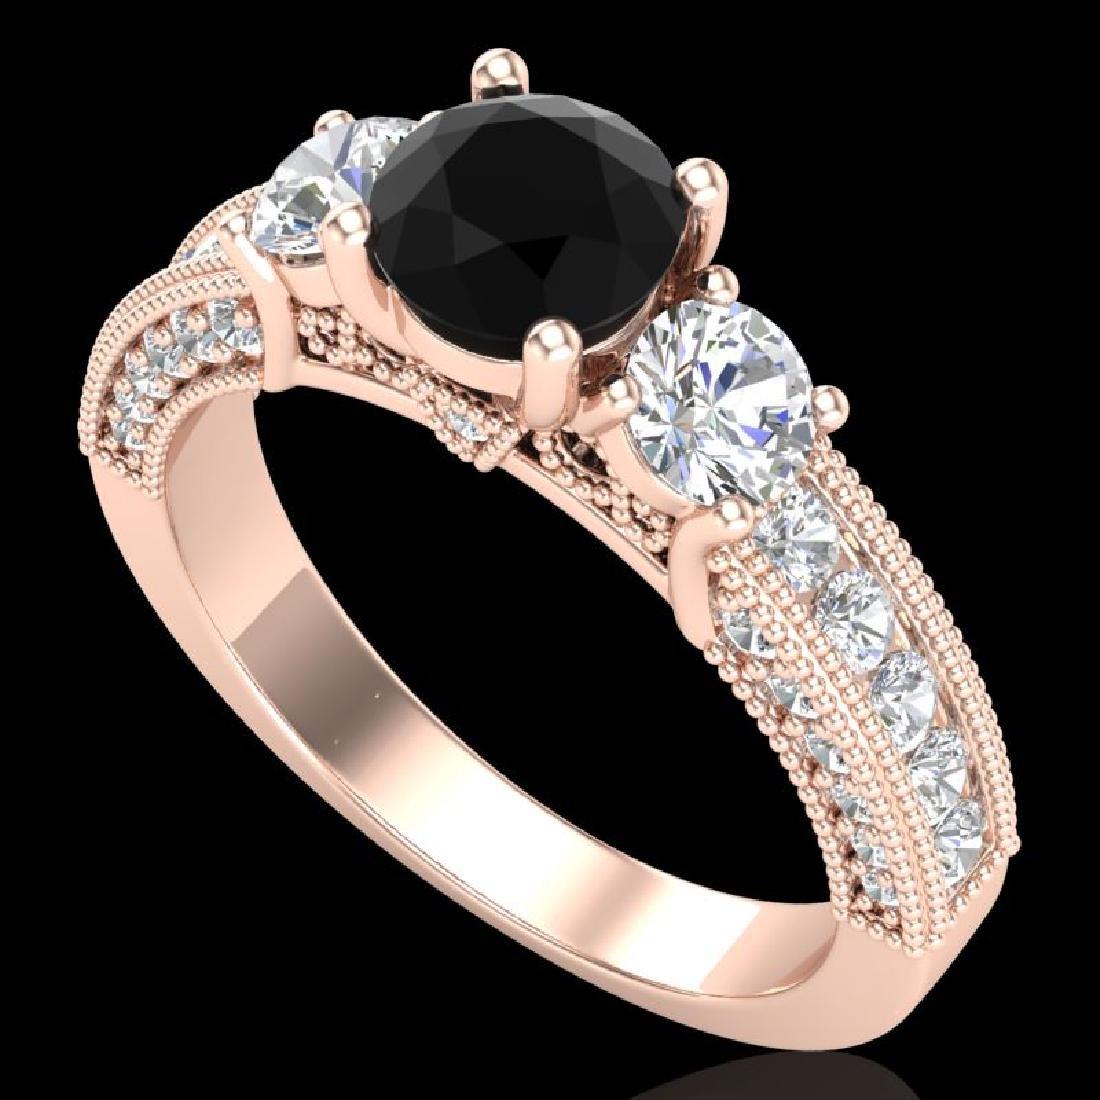 2.07 CTW Fancy Black Diamond Solitaire Art Deco 3 Stone